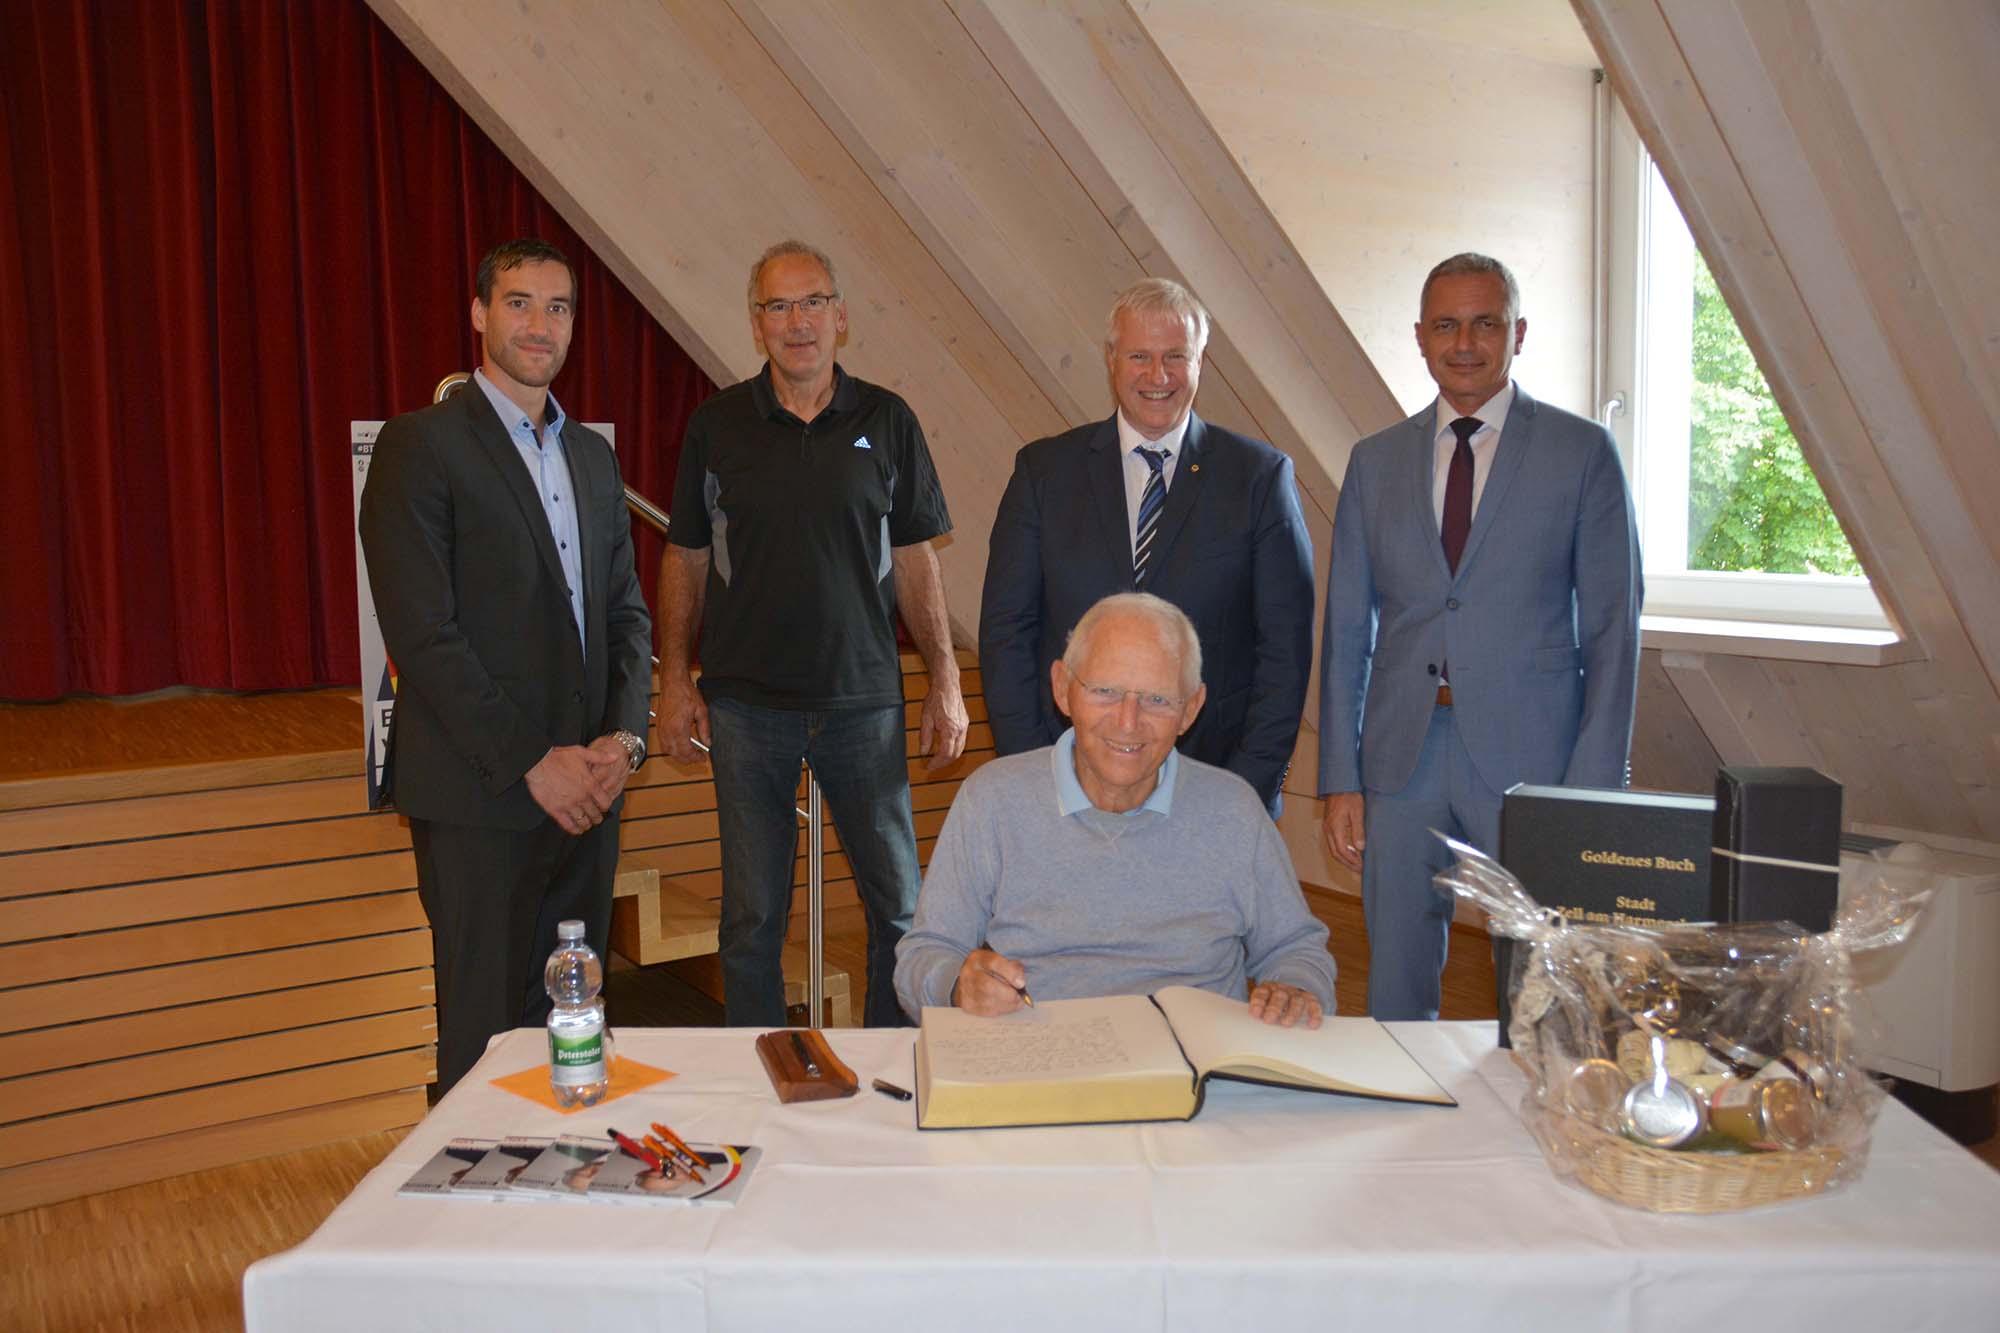 2021-8-25-ZE-UE-hps-CDU Familienfest Schäuble-DSC_0509 2